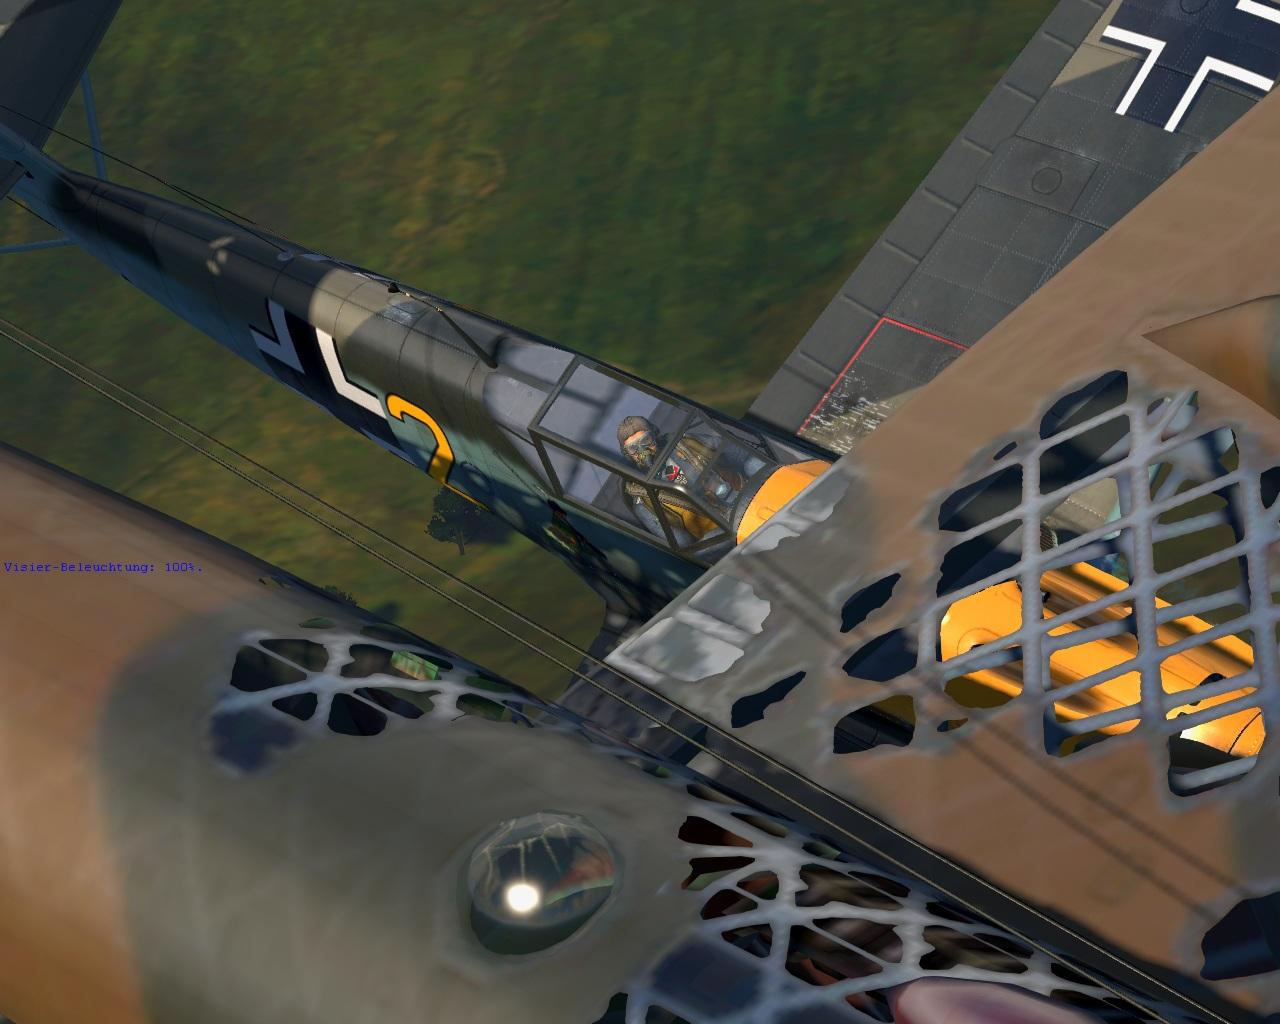 Launcher2014-04-1615-11-25-48.jpg